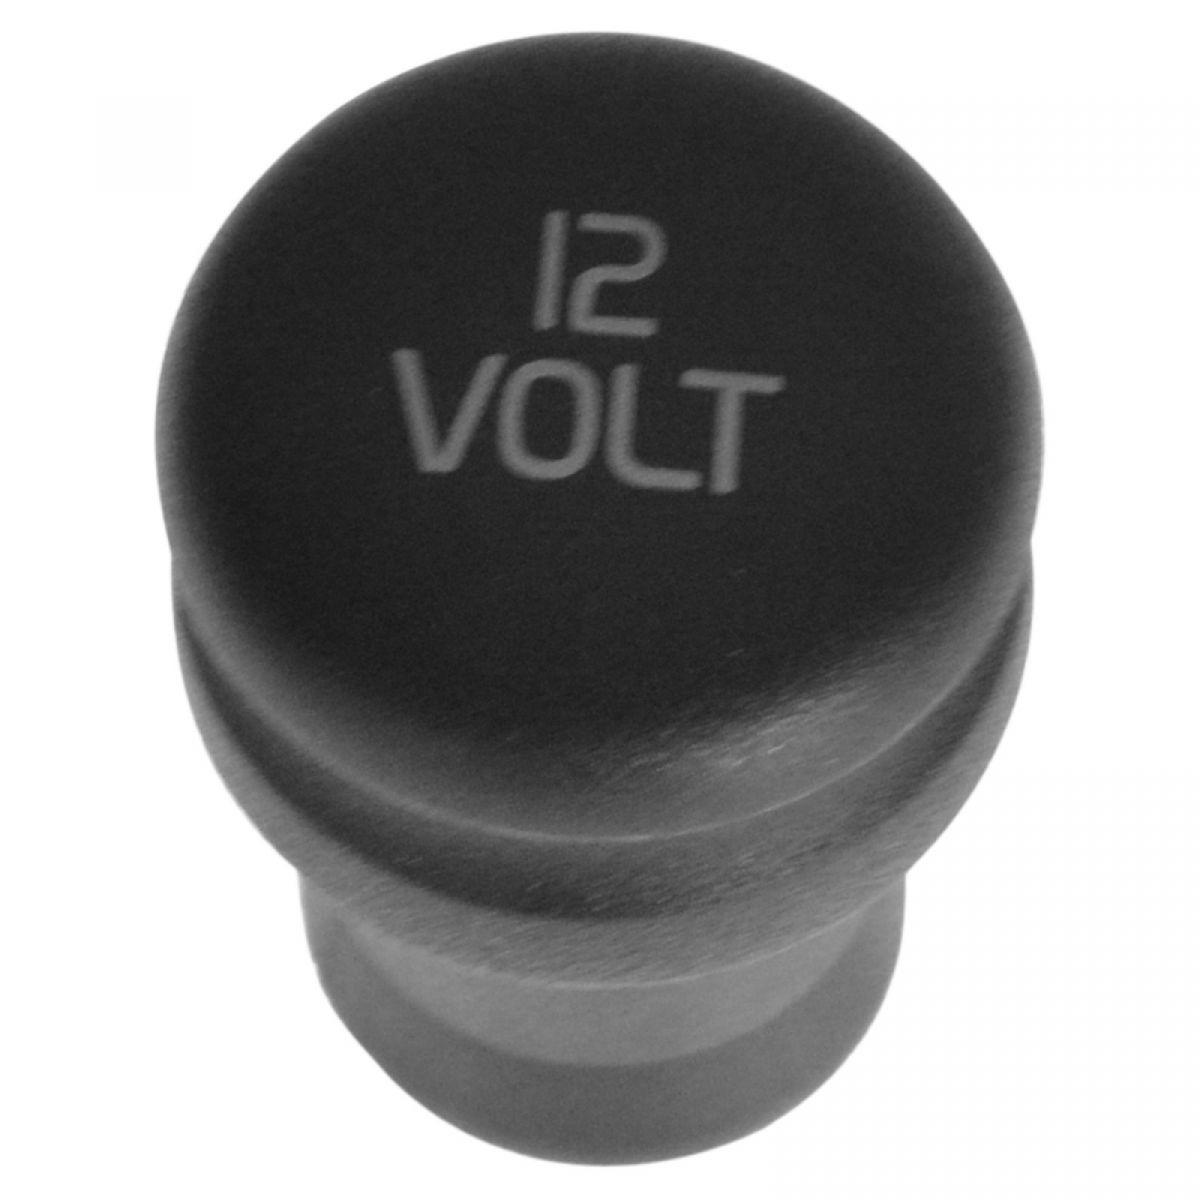 Oem 8685460 Auxiliary 12 Volt Cigarette Lighter Socket